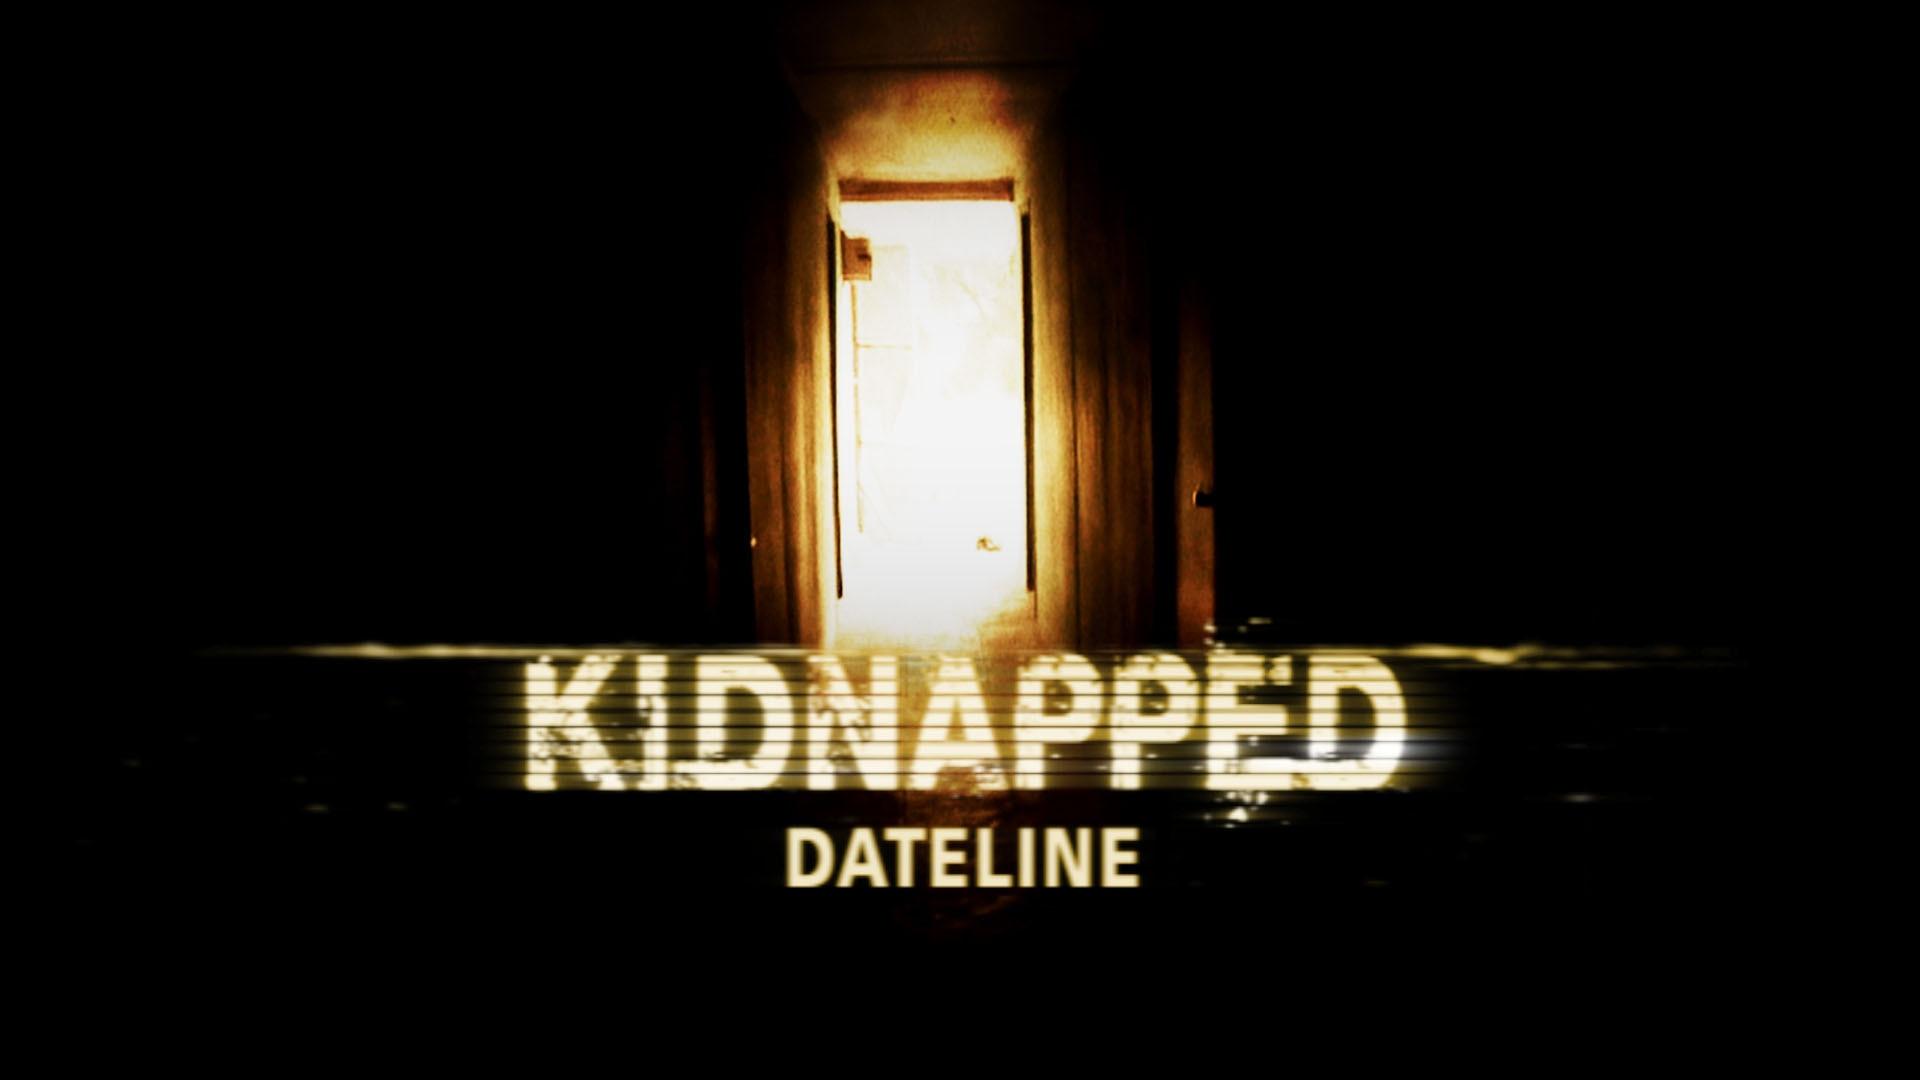 Watch Dateline Episode: Kidnapped: A Dateline Survival